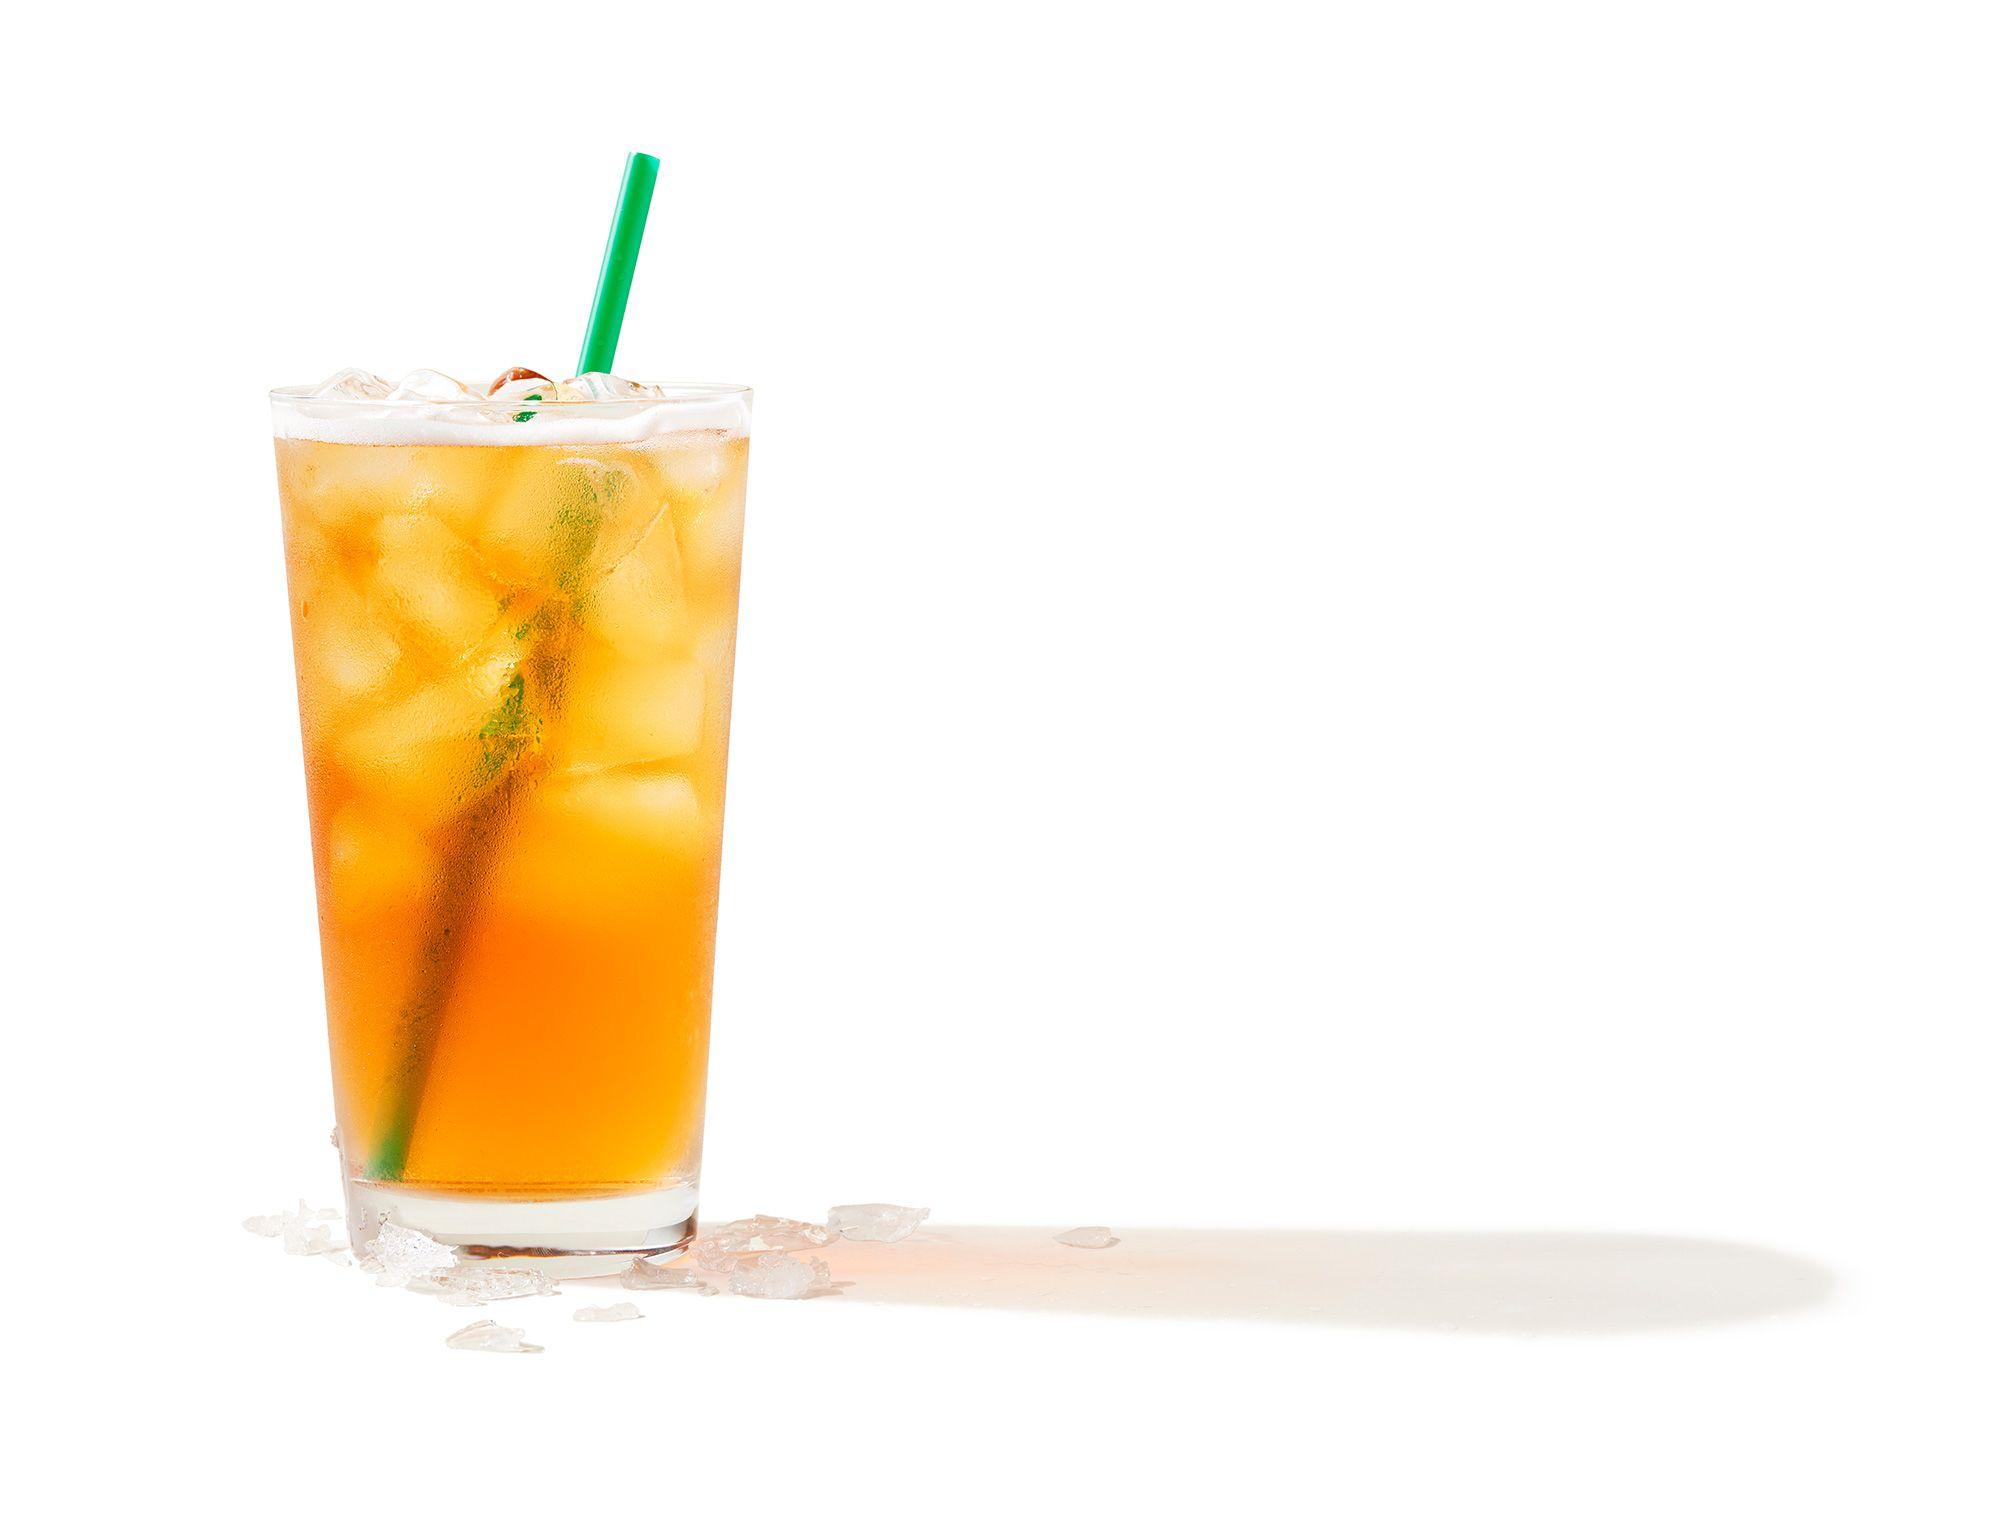 Healthy Starbucks drinks: 10 Starbucks drinks under 100 calories